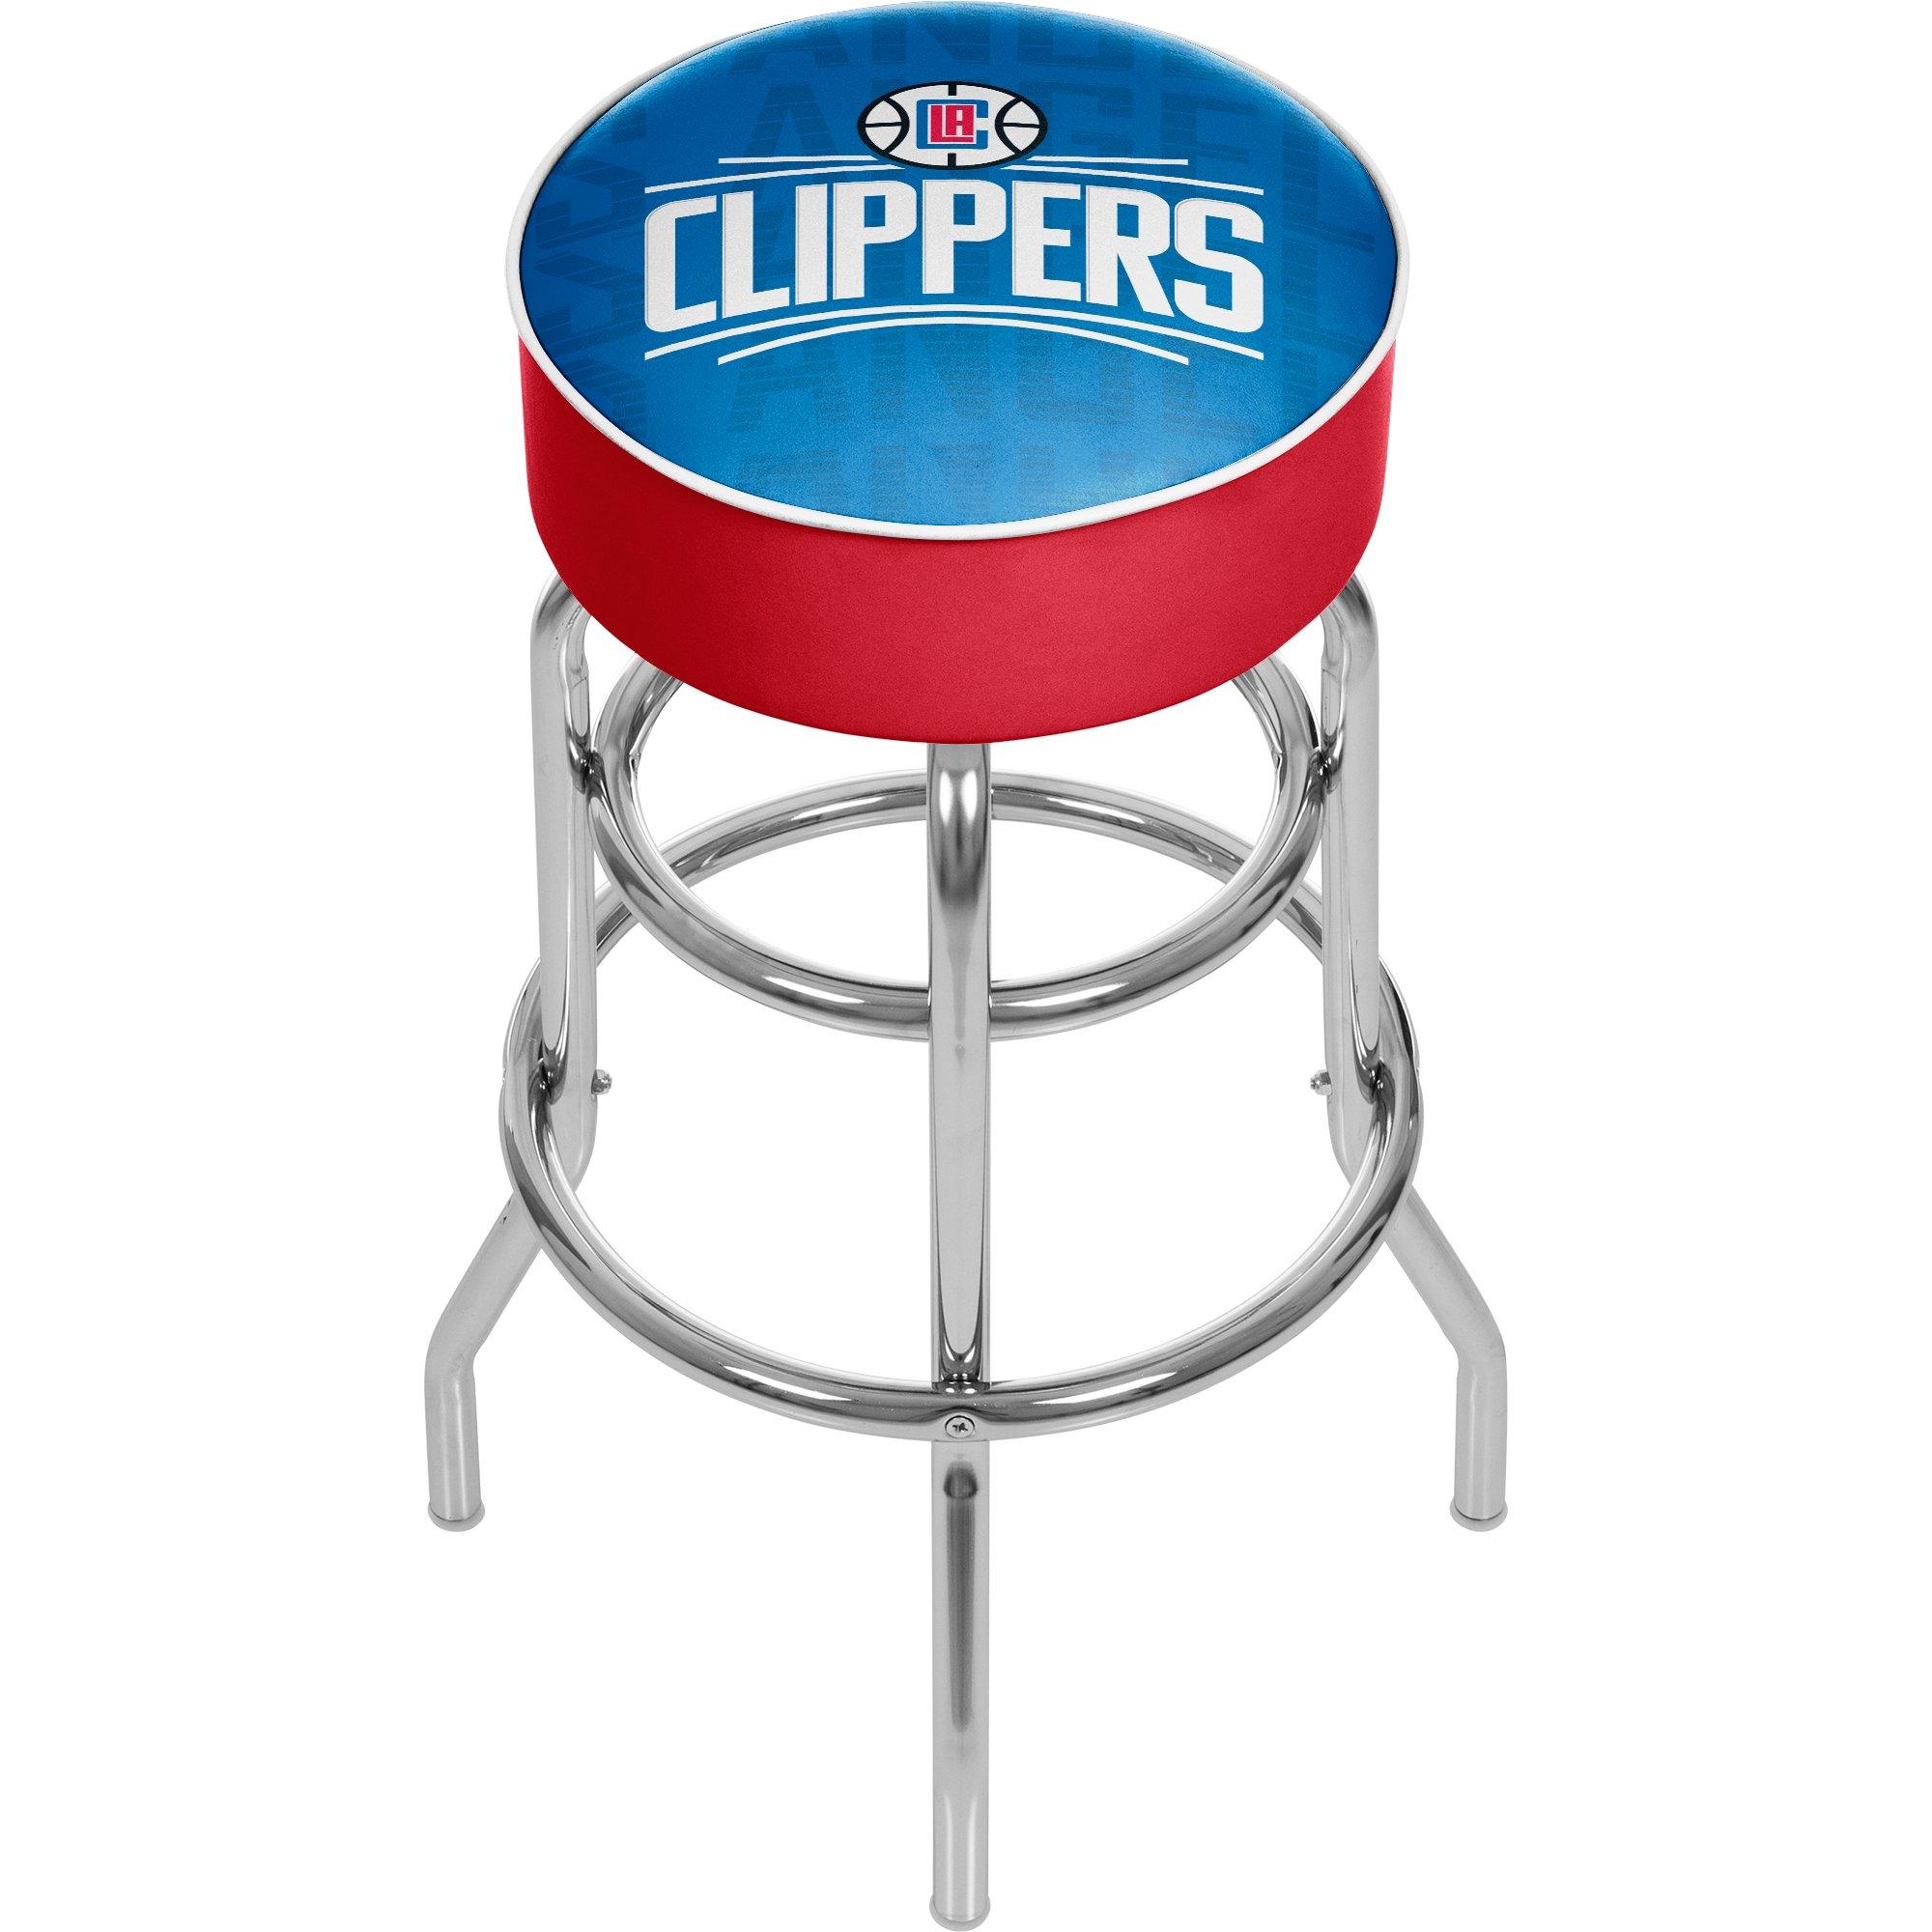 Trademark Gameroom NBA1000-LAC3 NBA Padded Swivel bar Stool - City - Los Angeles Clippers